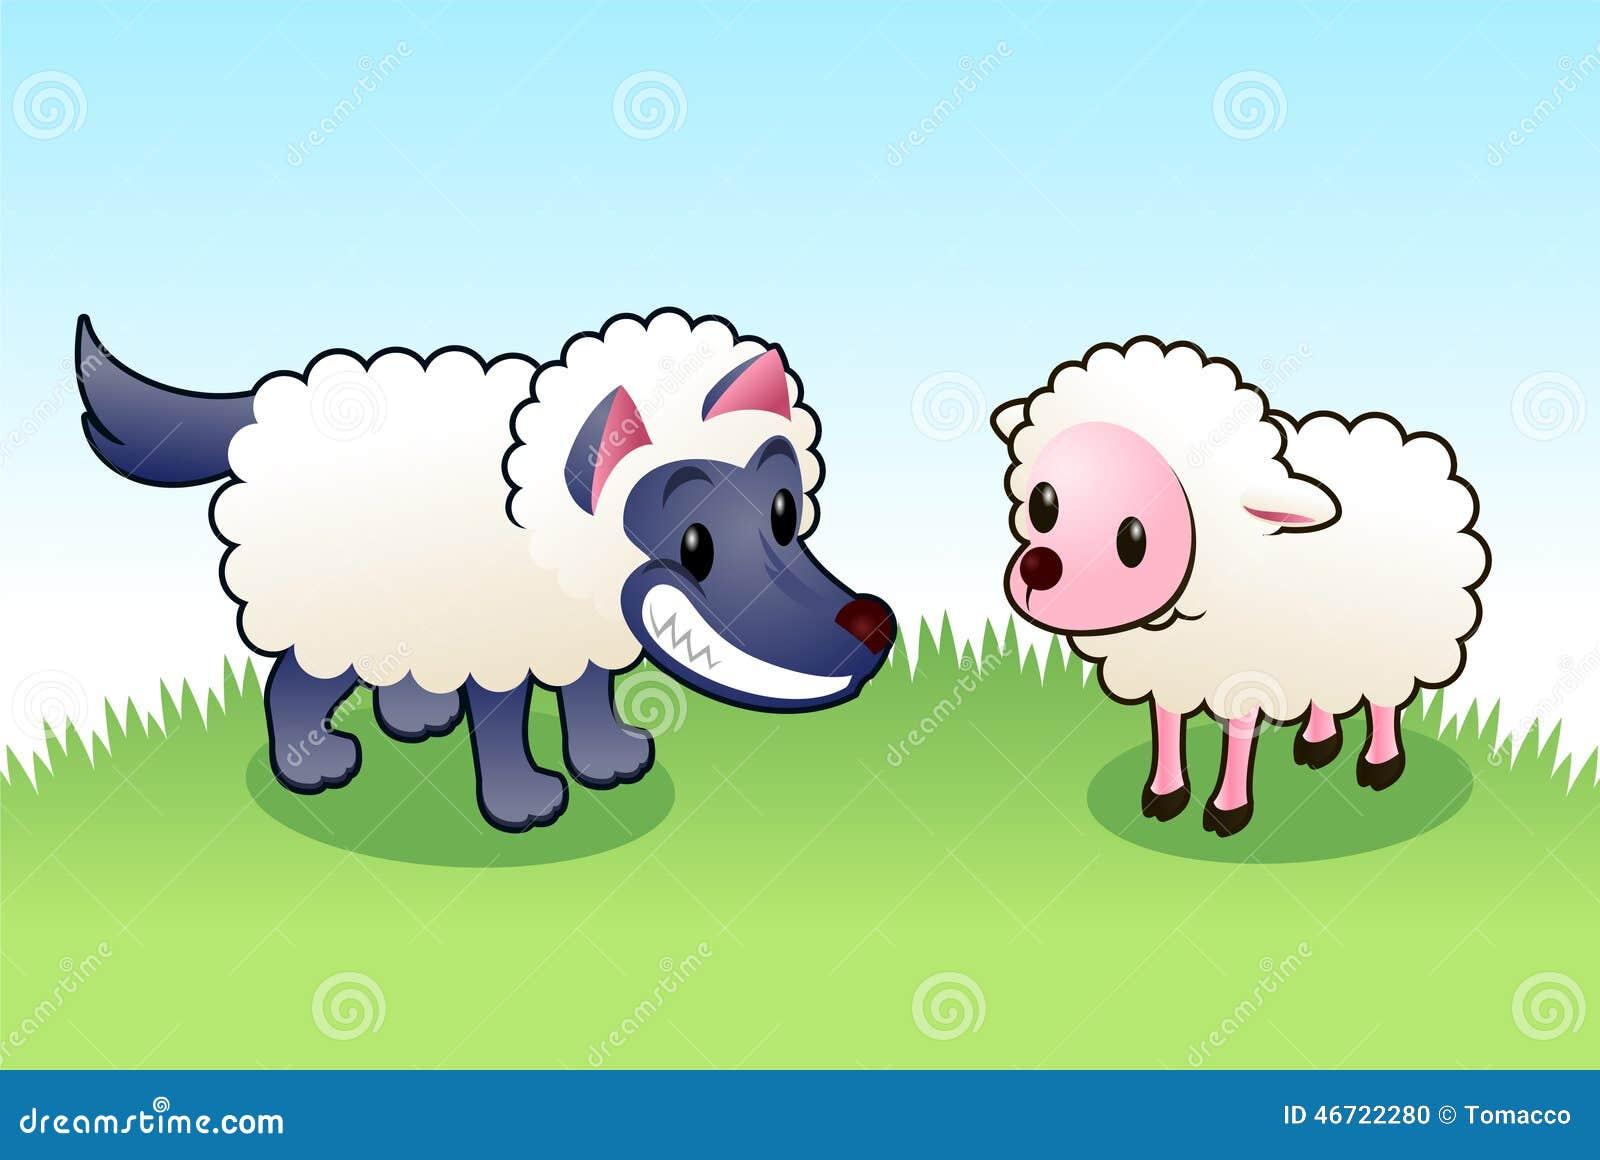 in sheeps clothing free pdf downloadf